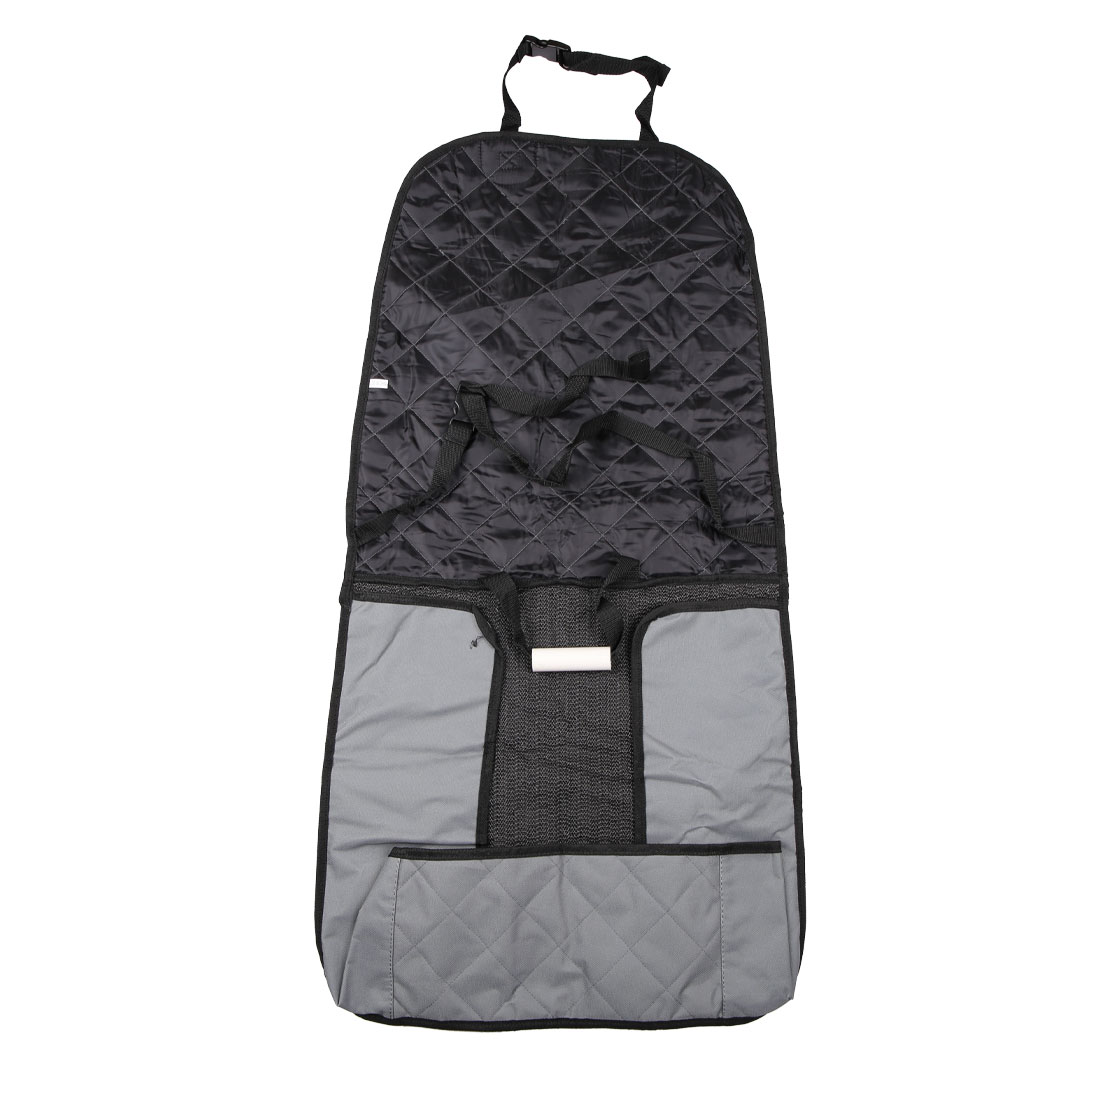 Gray Pet Dog Car Rear Back  Waterproof Cushion Cover Blanket Protector